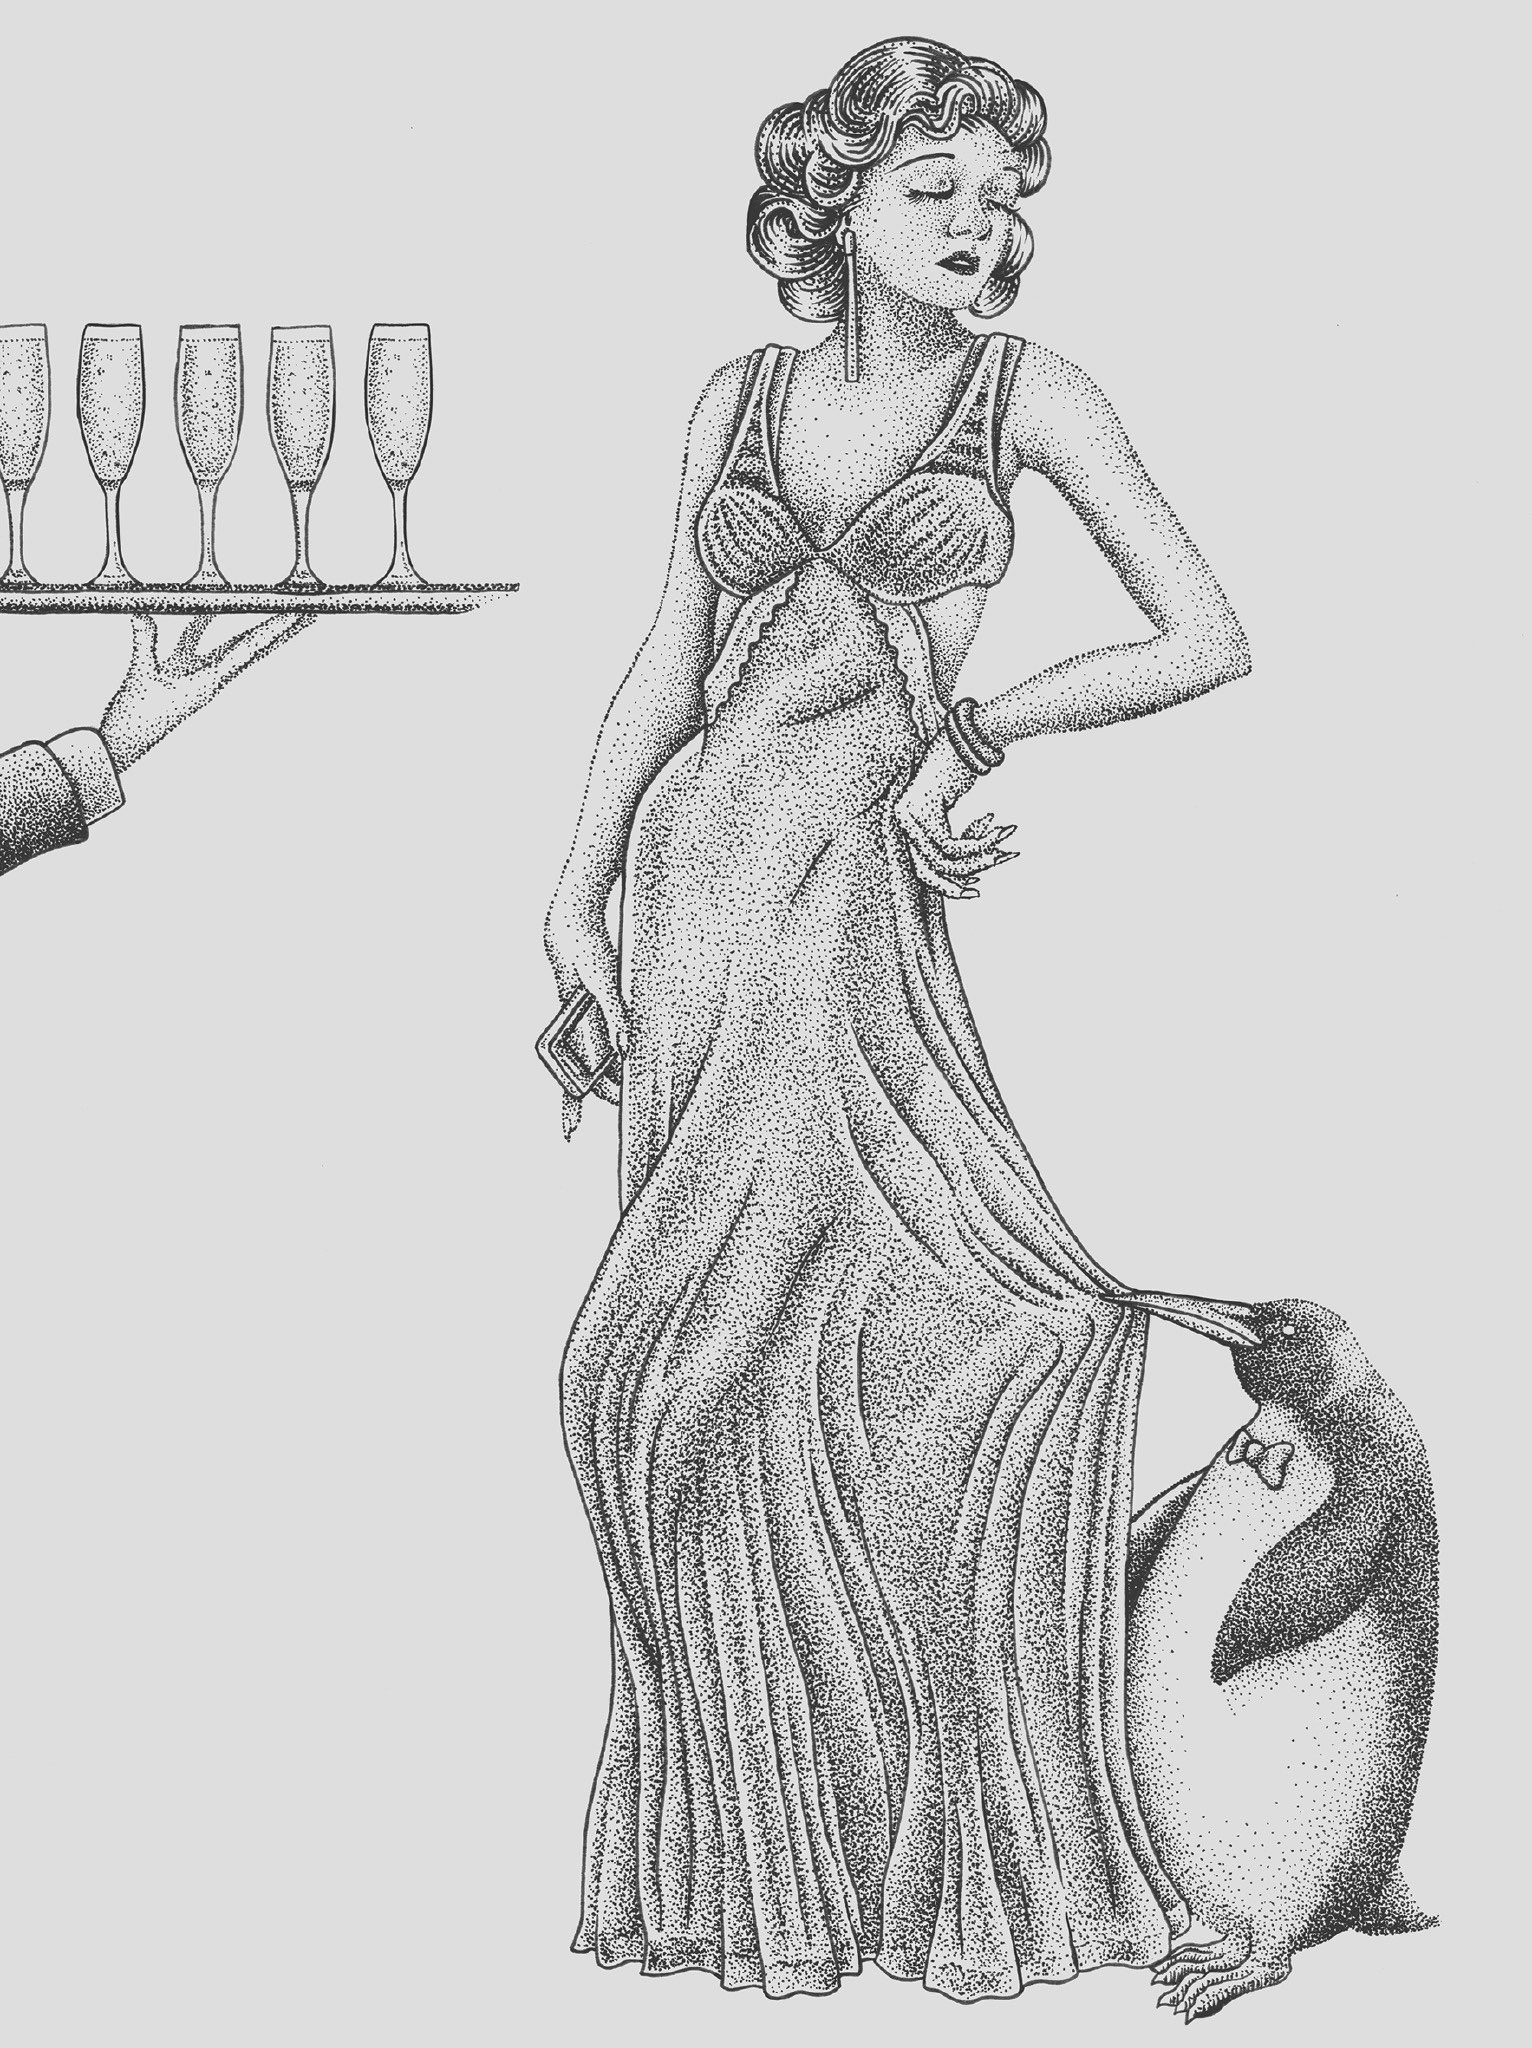 Work of love - La robe chemise de nuit | GALERIE TREIZE-DIX - Førtifem | Work of love - La robe chemise de nuit